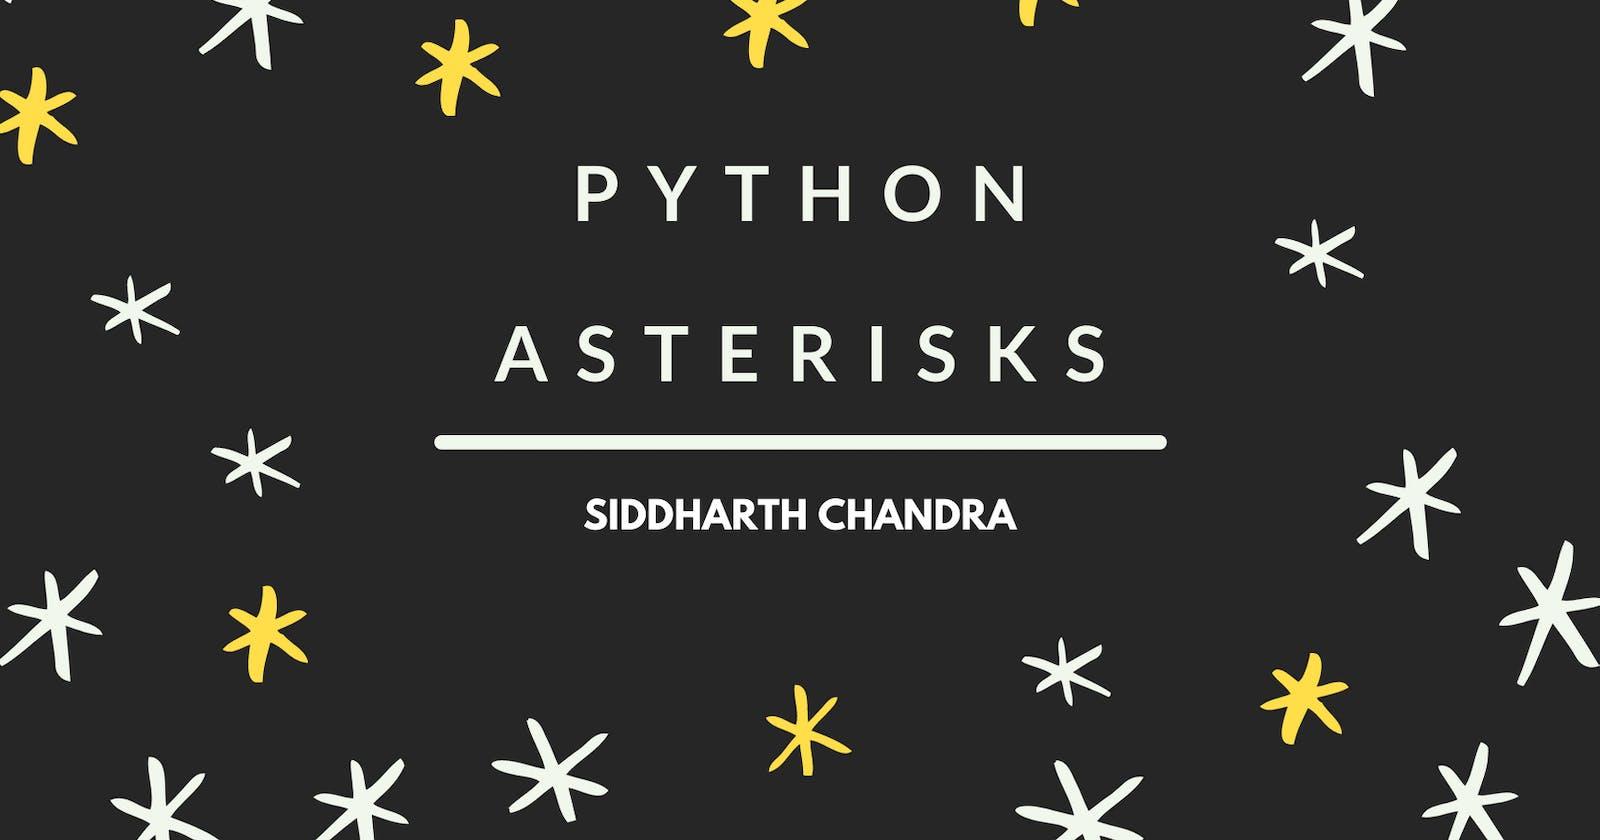 Python Asterisks